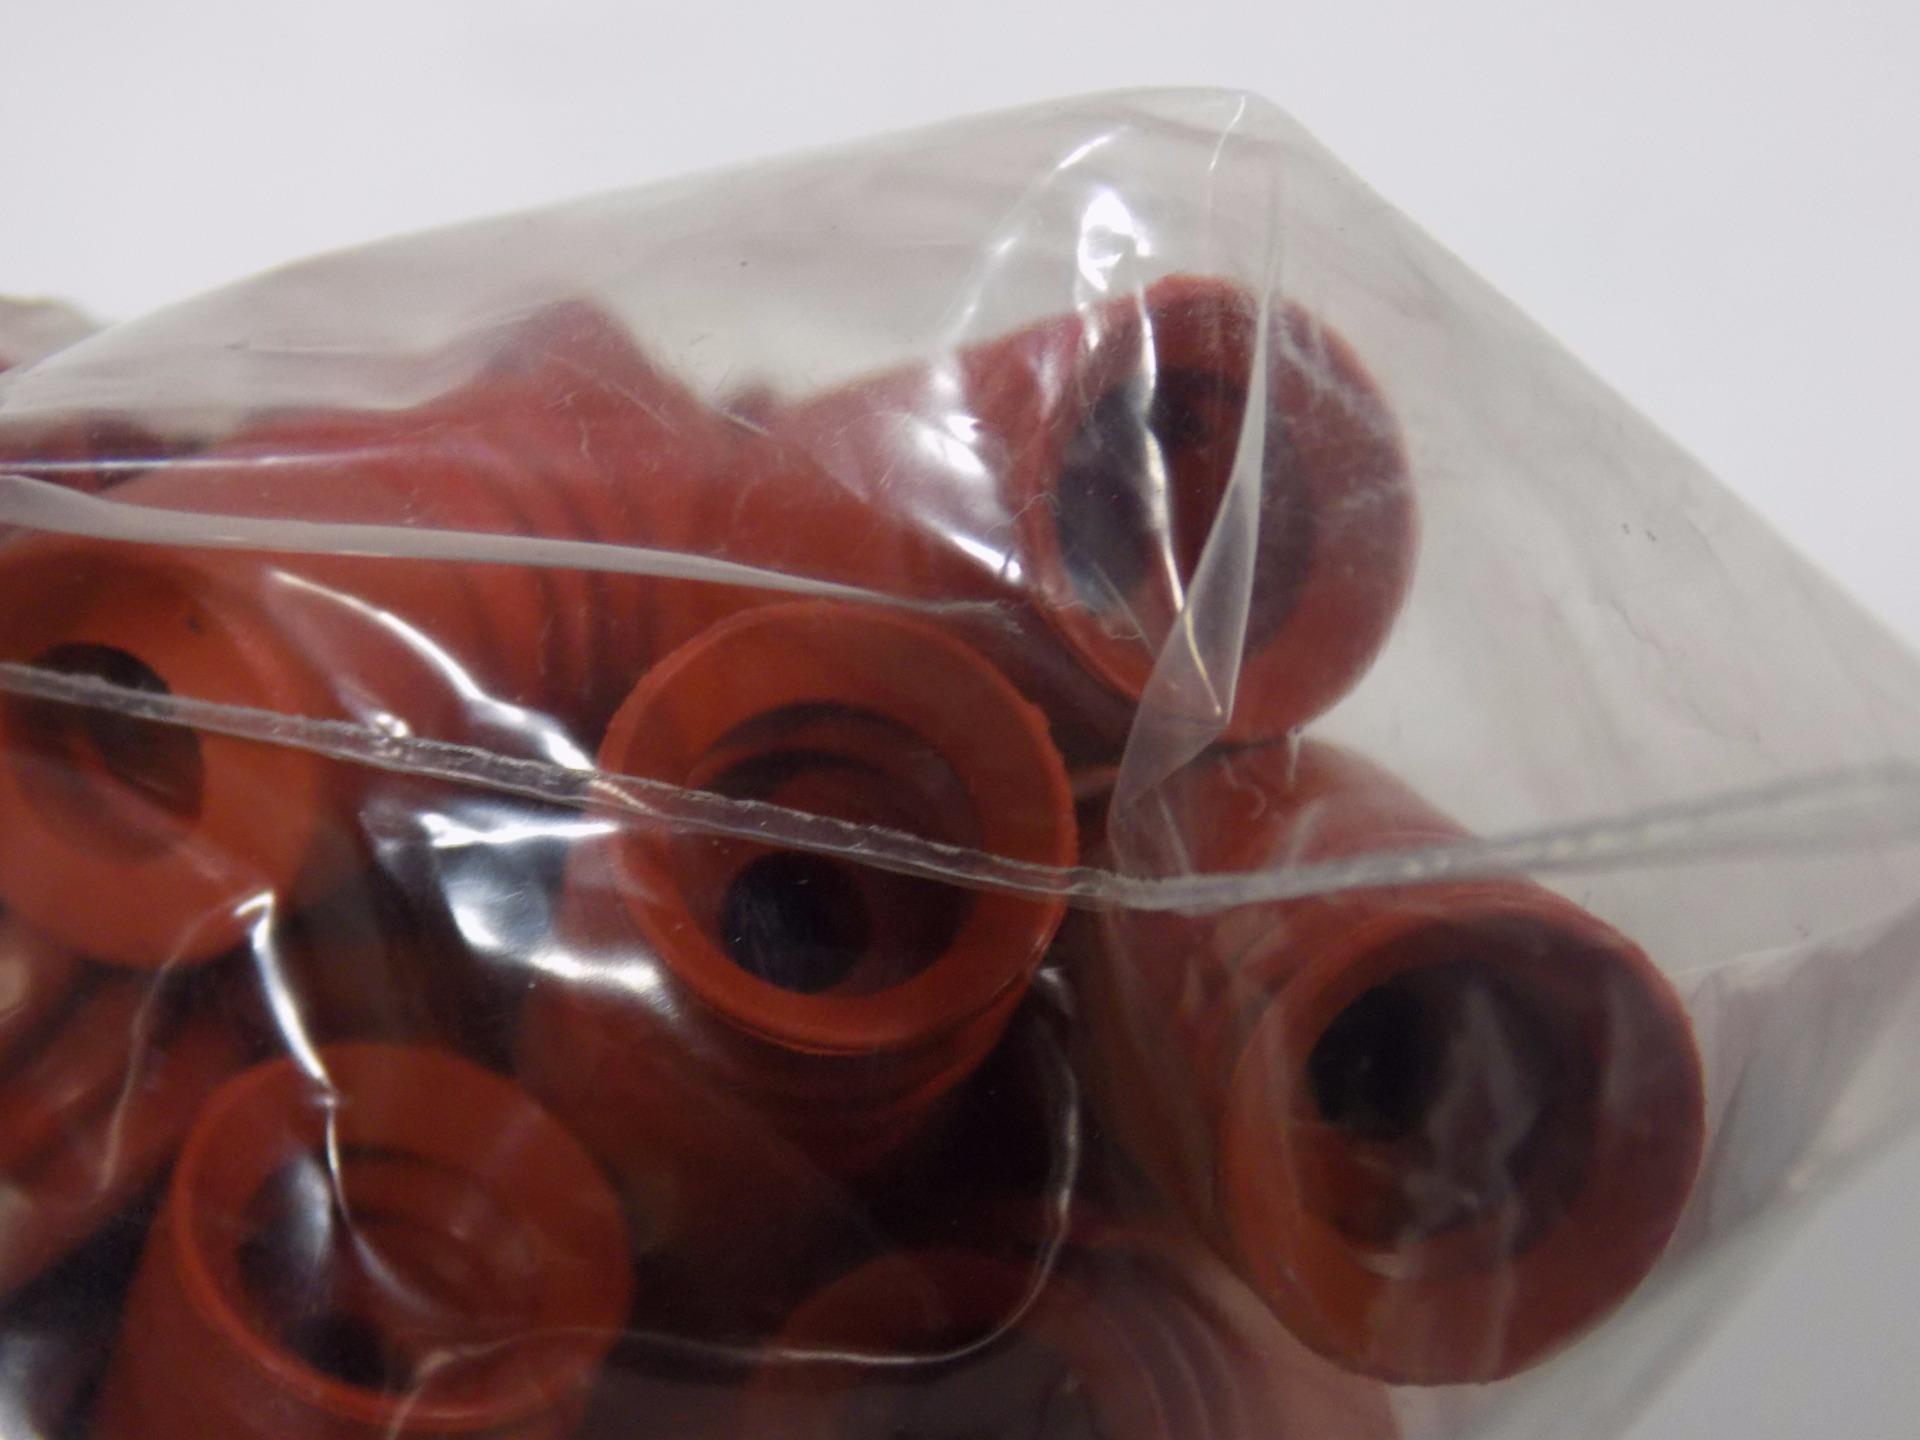 NEW Suction Cup B25XP Polyurethane 30//60 M5 Female